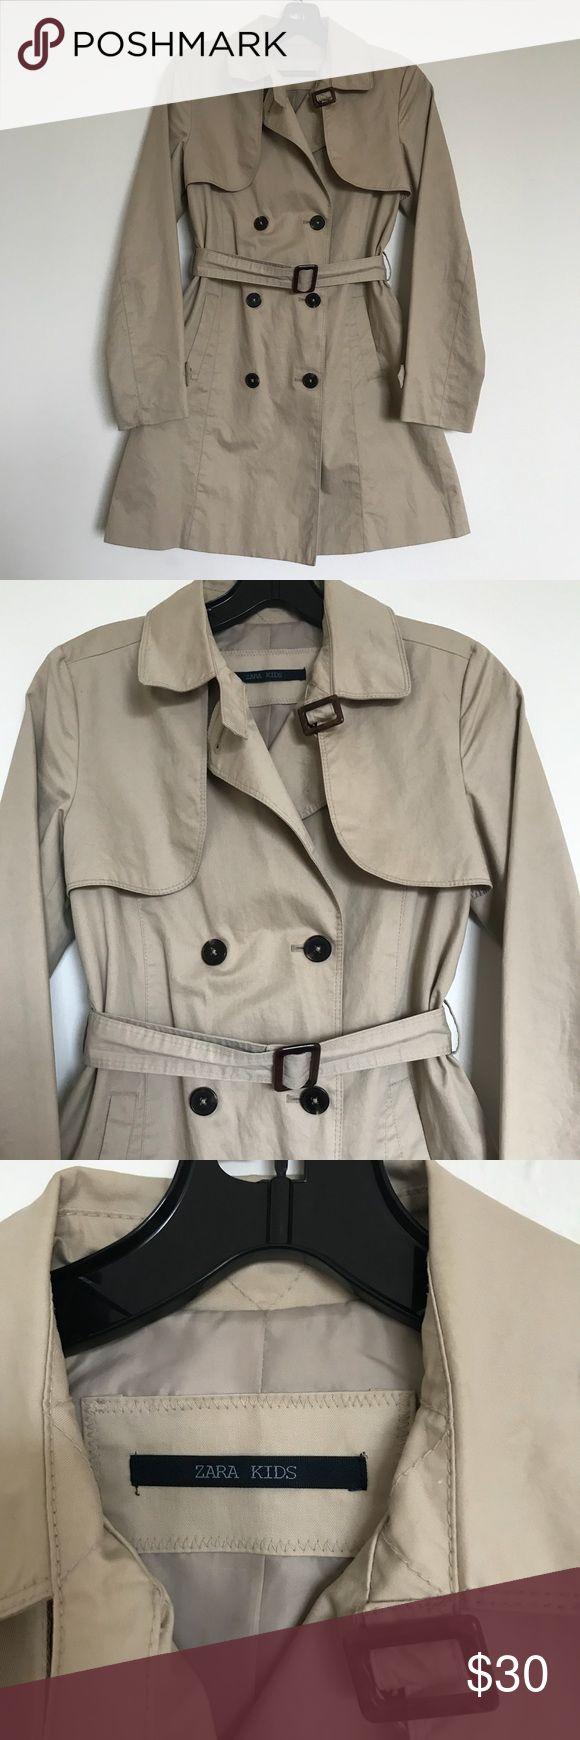 ZARA KIDS GIRLS TRENCH COAT 🧥 Gently used in great condition Zara Jackets & Coats